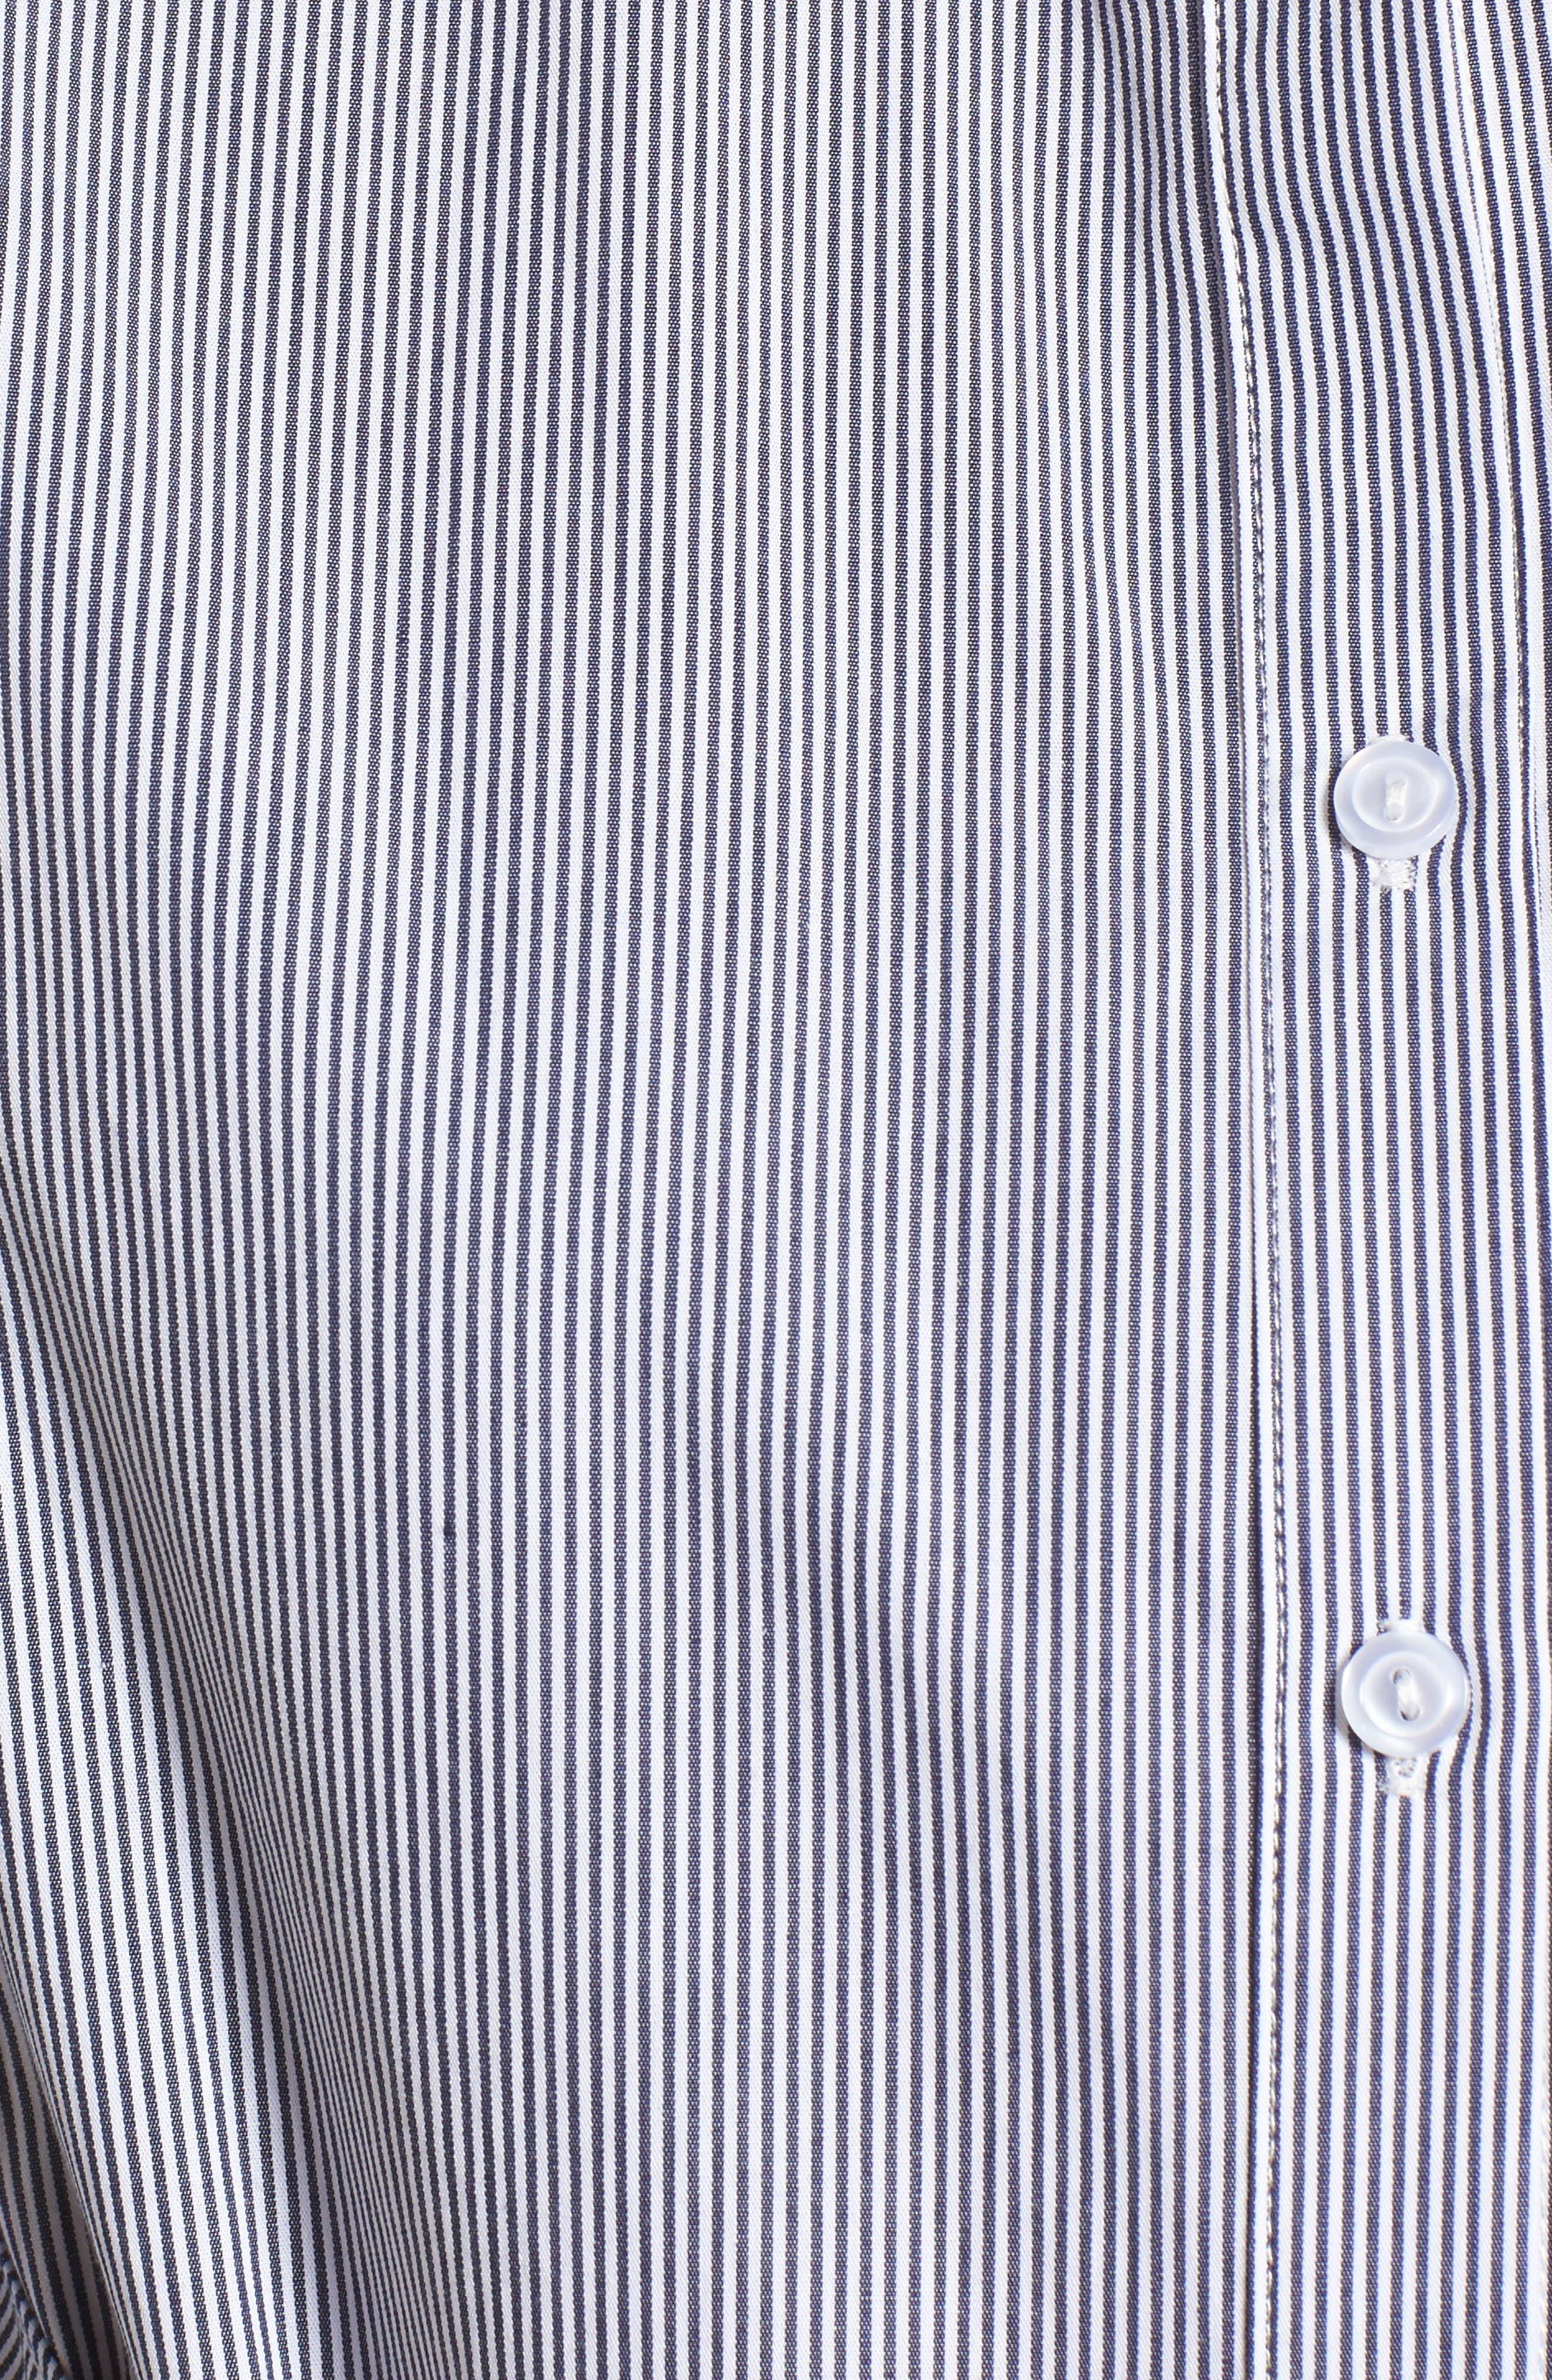 Tie Waist Shirtdress,                             Alternate thumbnail 5, color,                             001